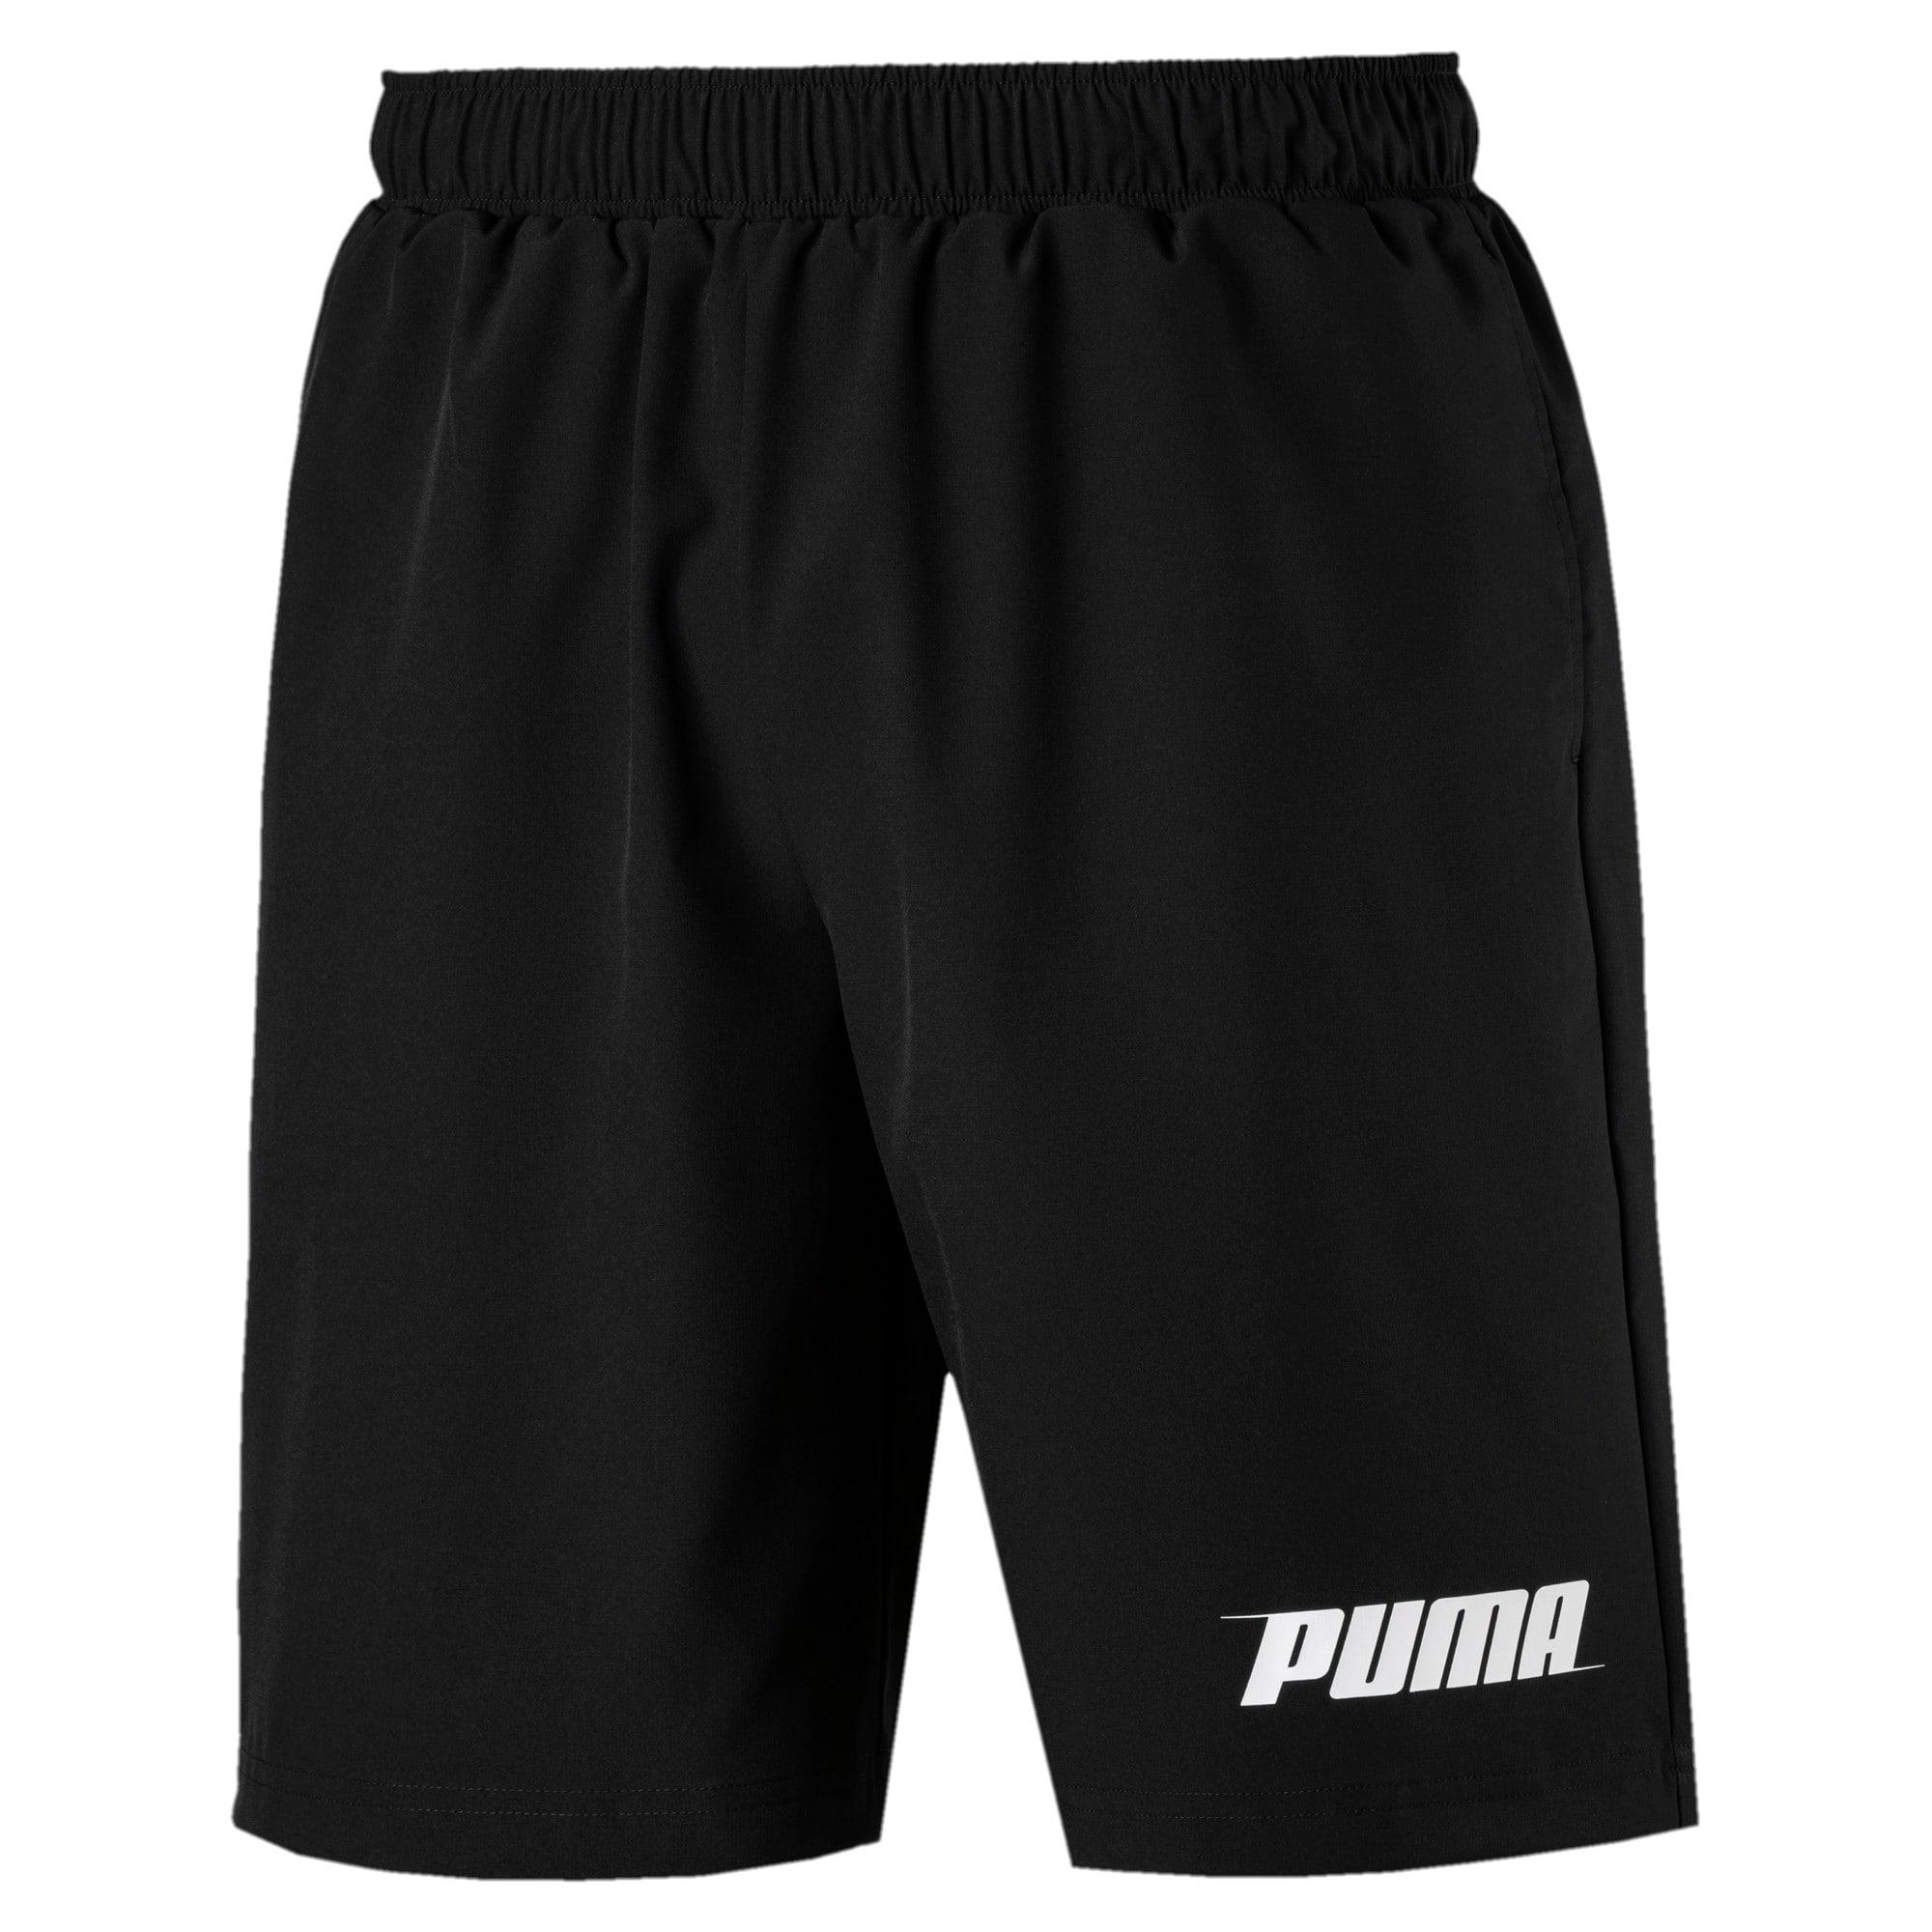 Thumbnail 1 of Rebel Herren Gewebte Shorts, Puma Black, medium